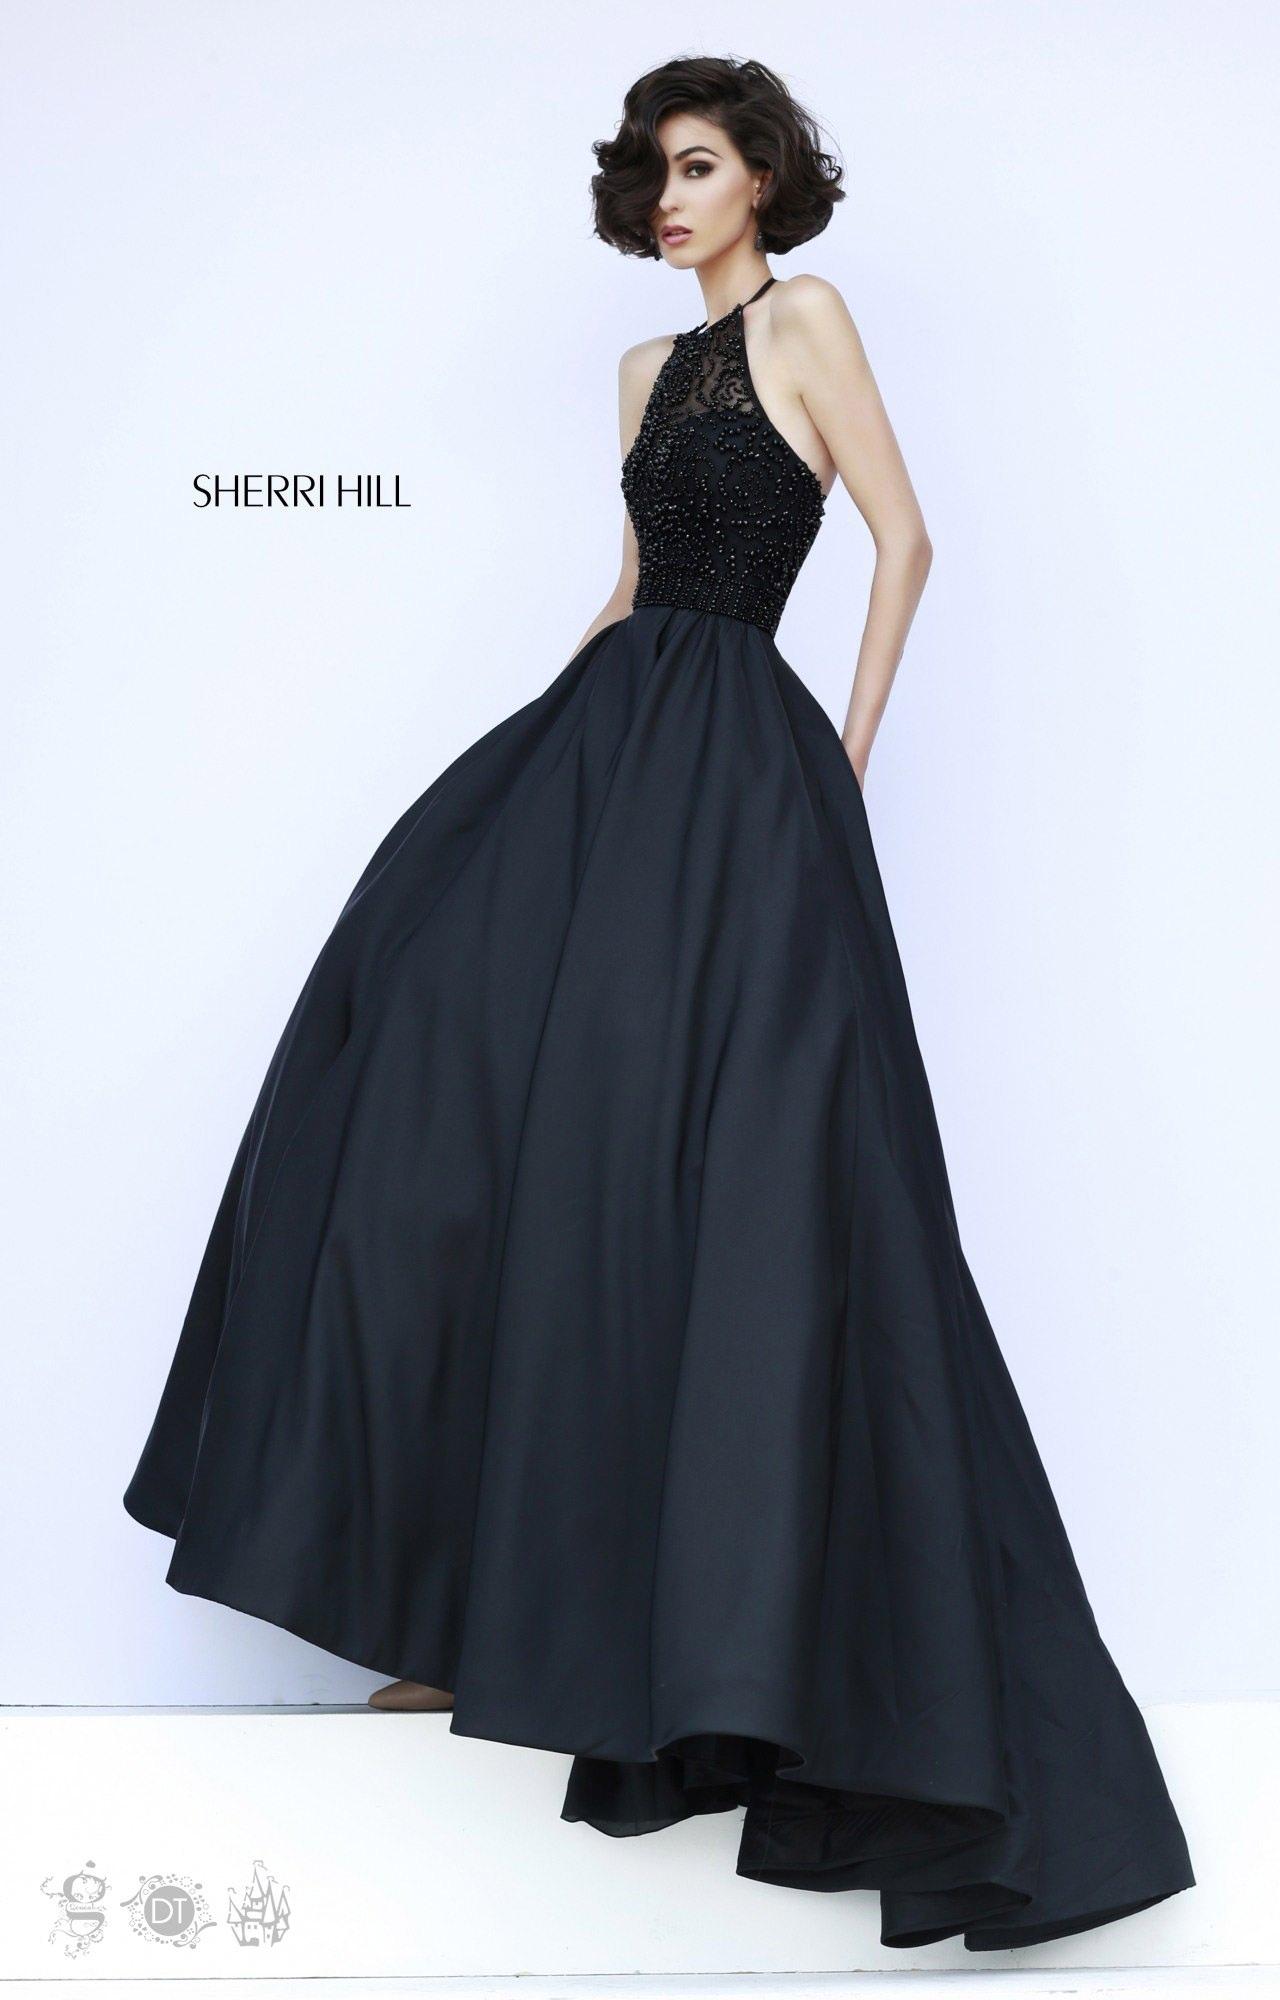 Sherri Hill Bailey Jane Dress